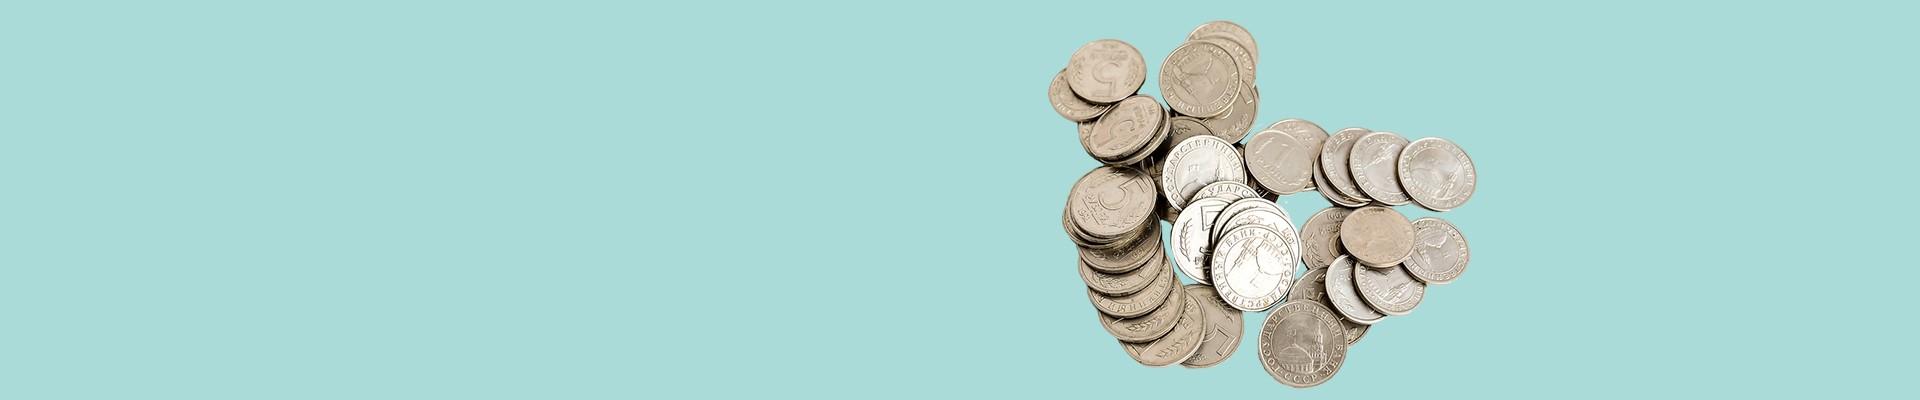 Jual Koleksi Uang Kuno Kertas / Uang Kuno Koin Lengkap